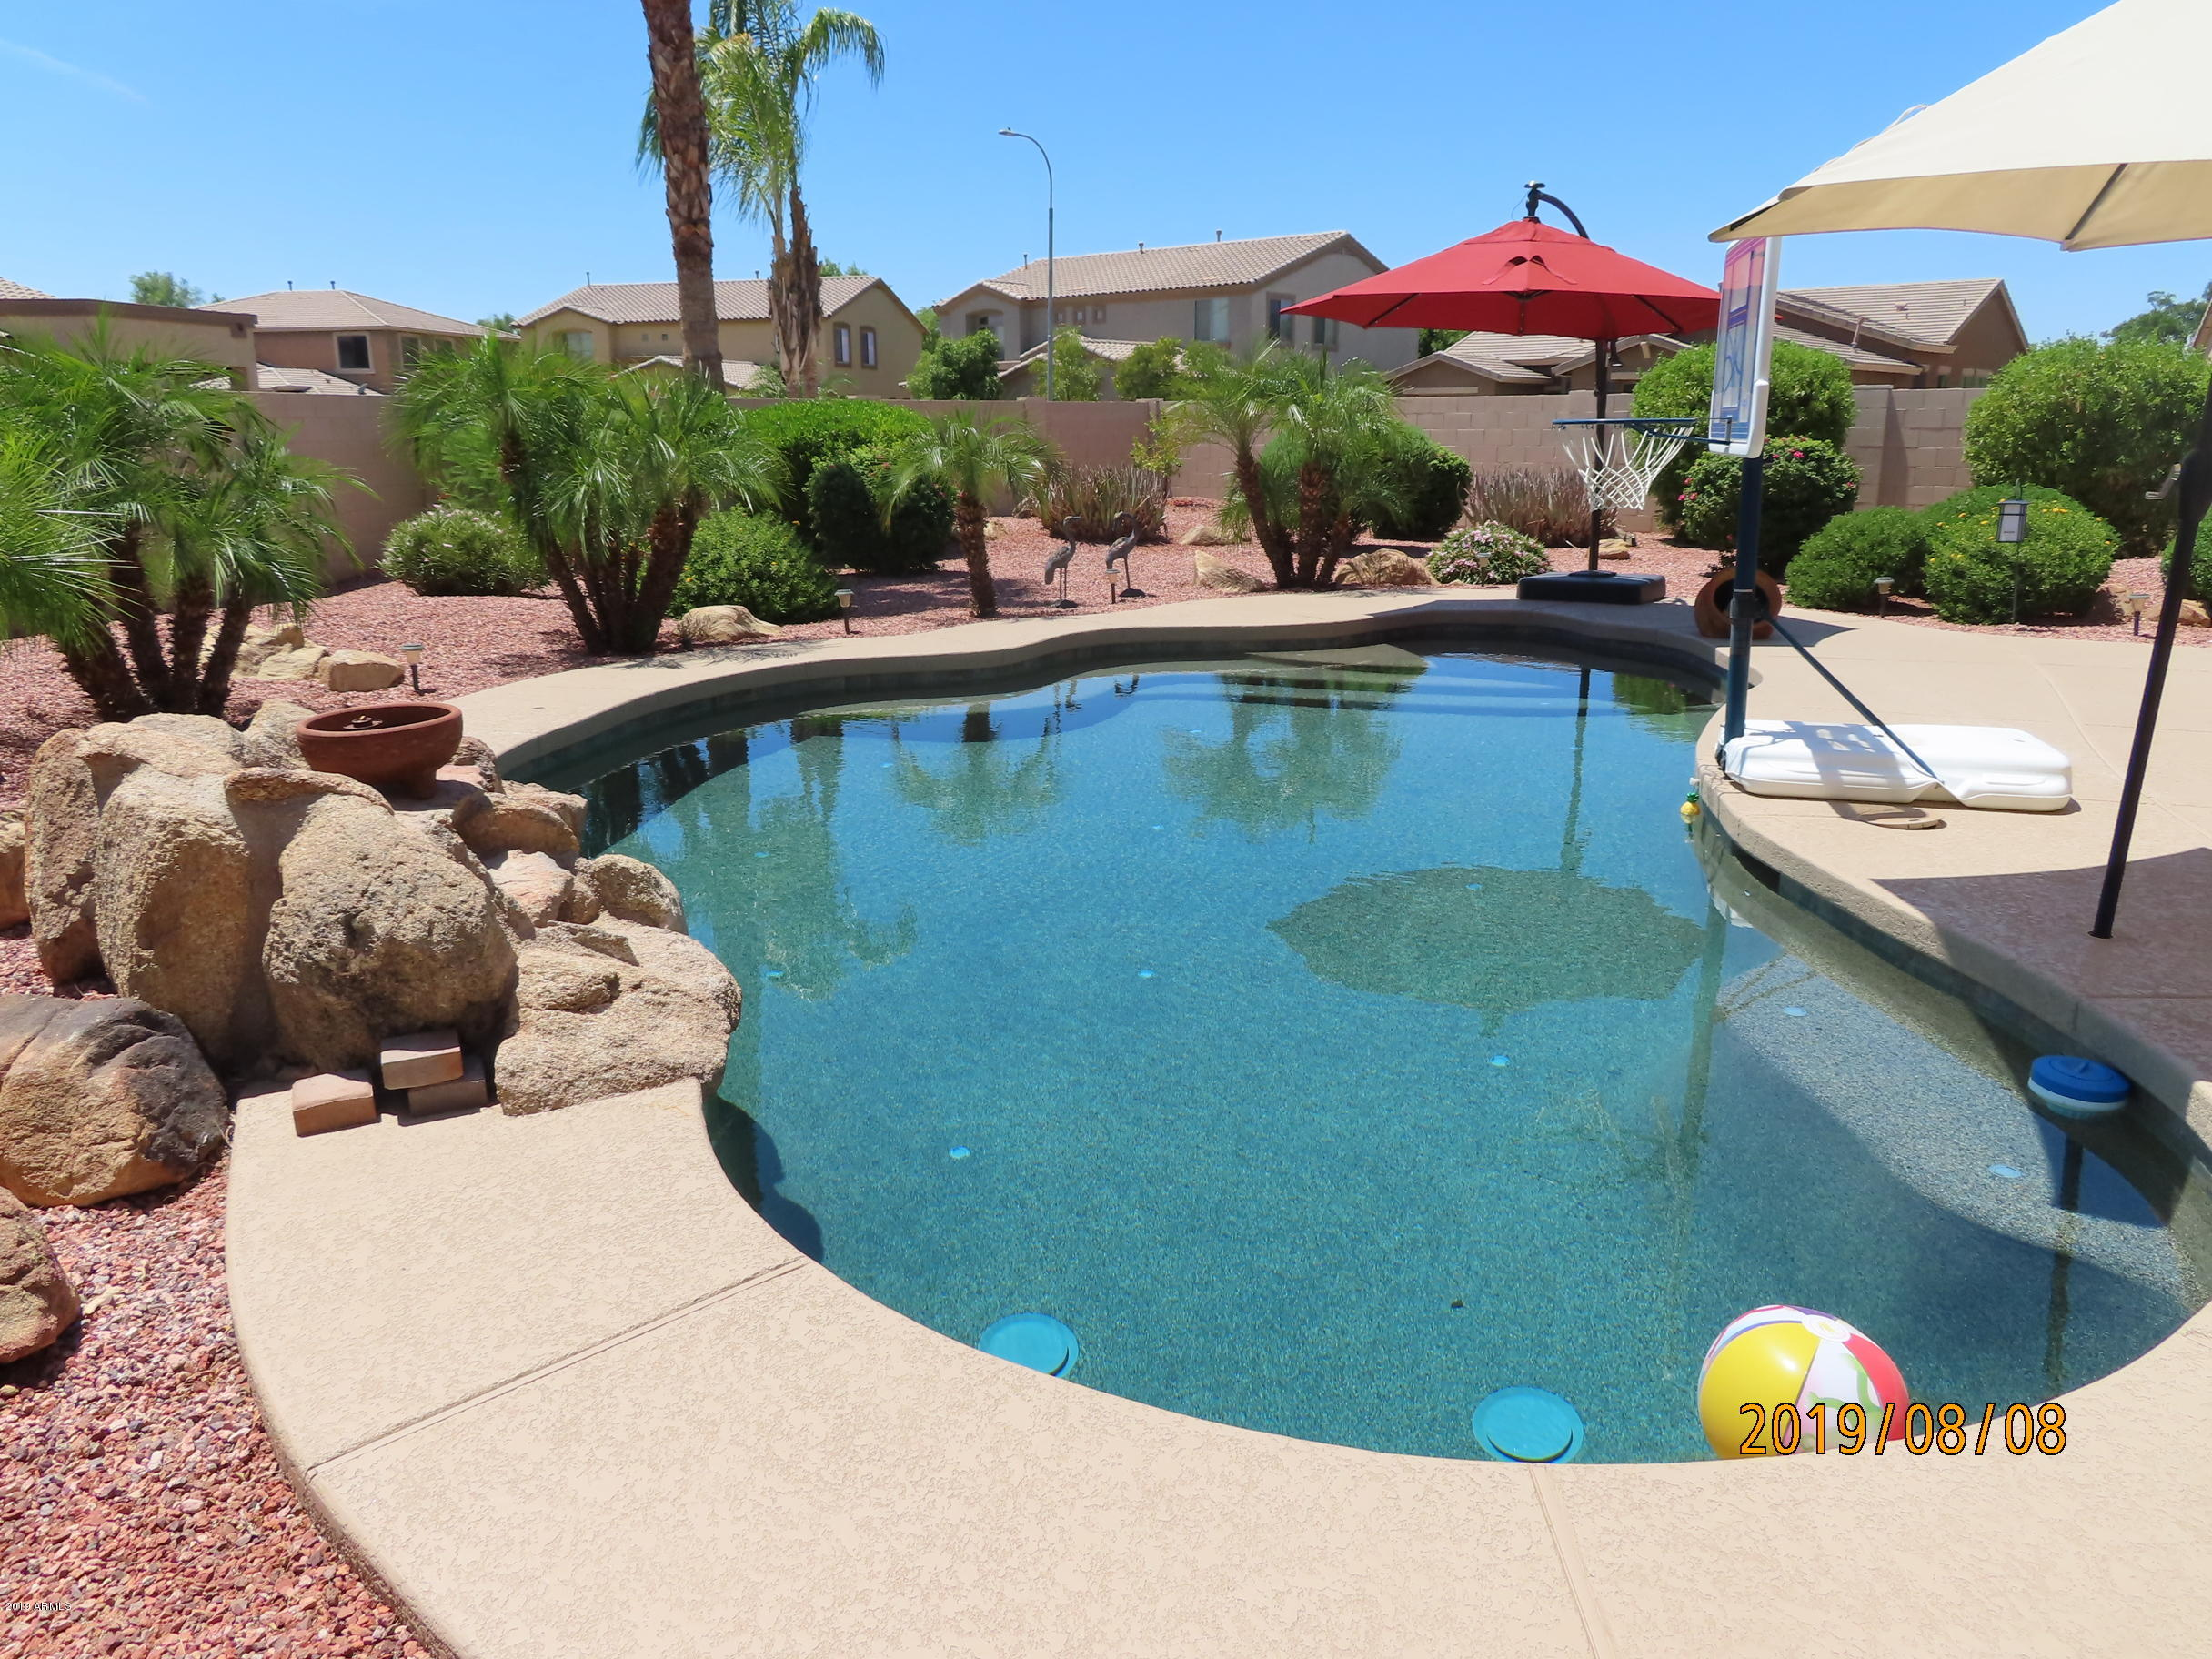 Photo of Avondale, AZ 85323